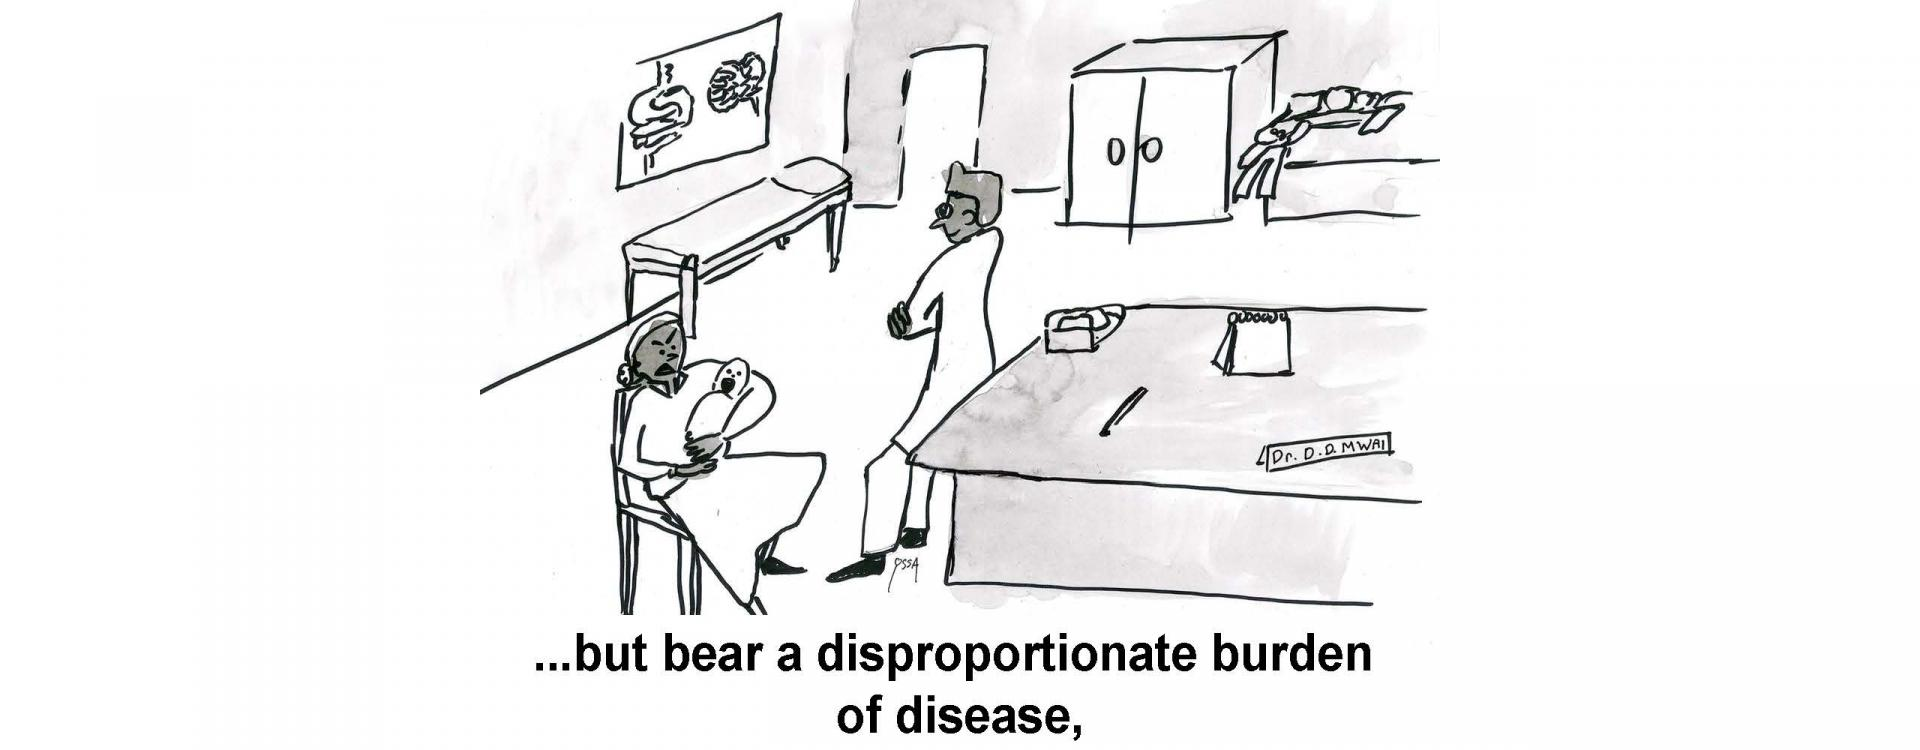 ...but bear a disproportionate burden of disease,